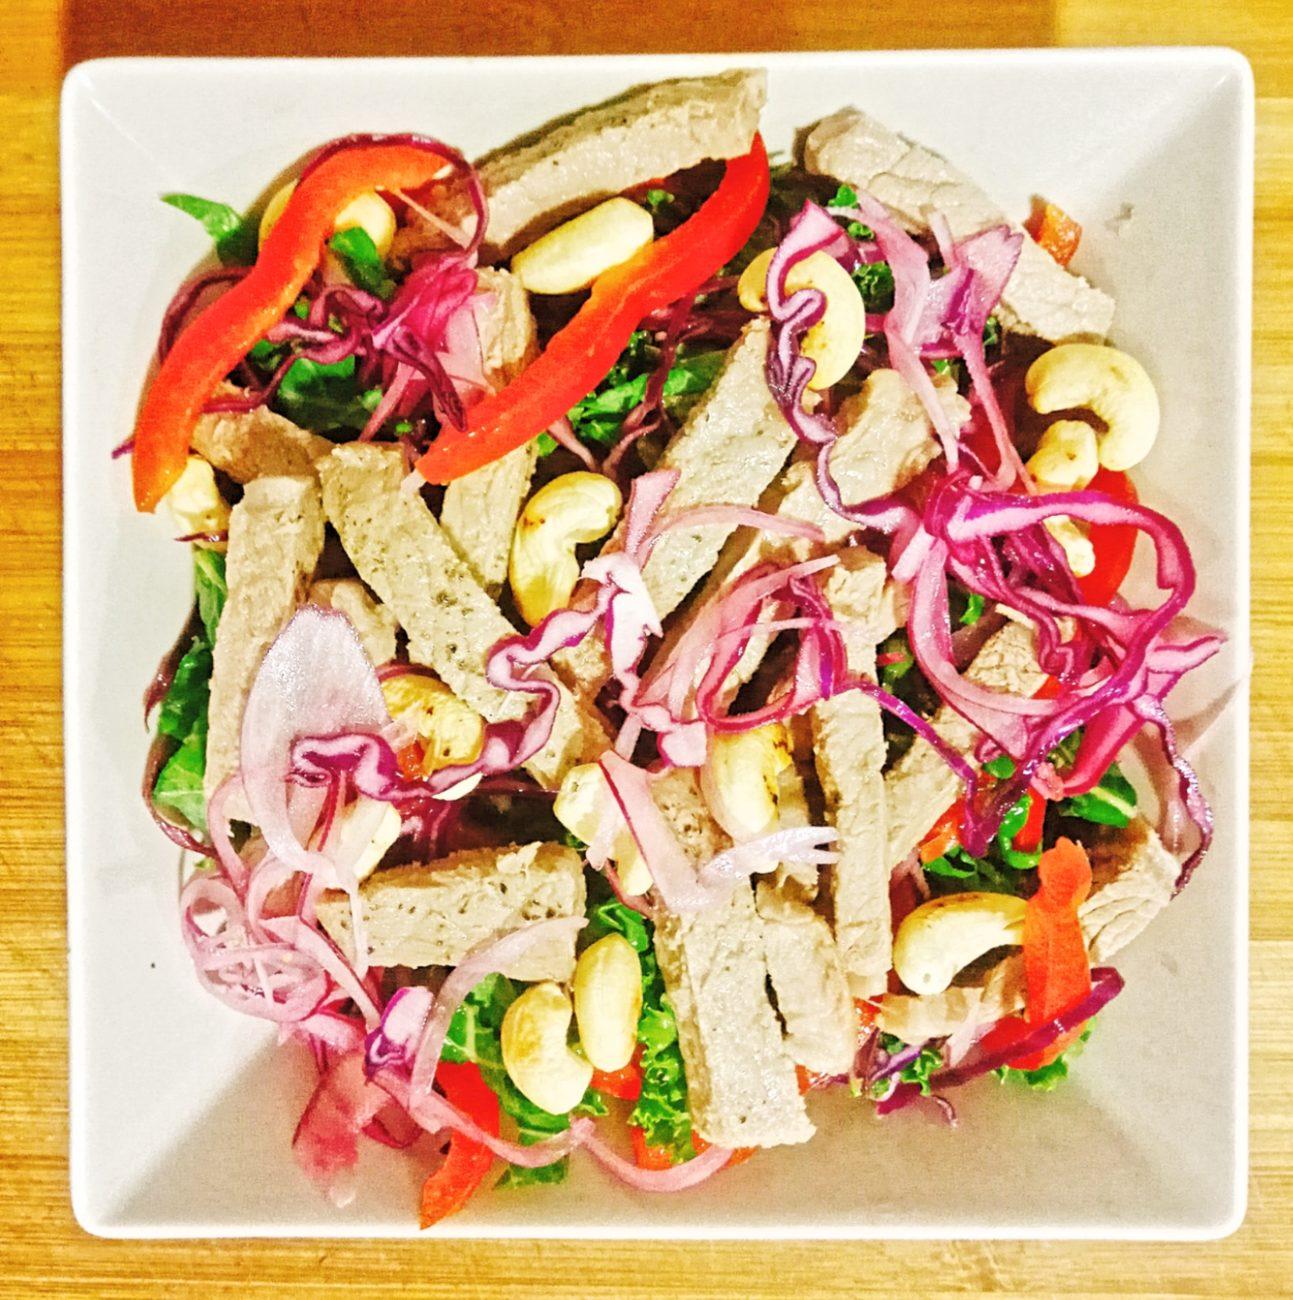 High Protein Thai Steak Salad with homemade Tahini Dressing